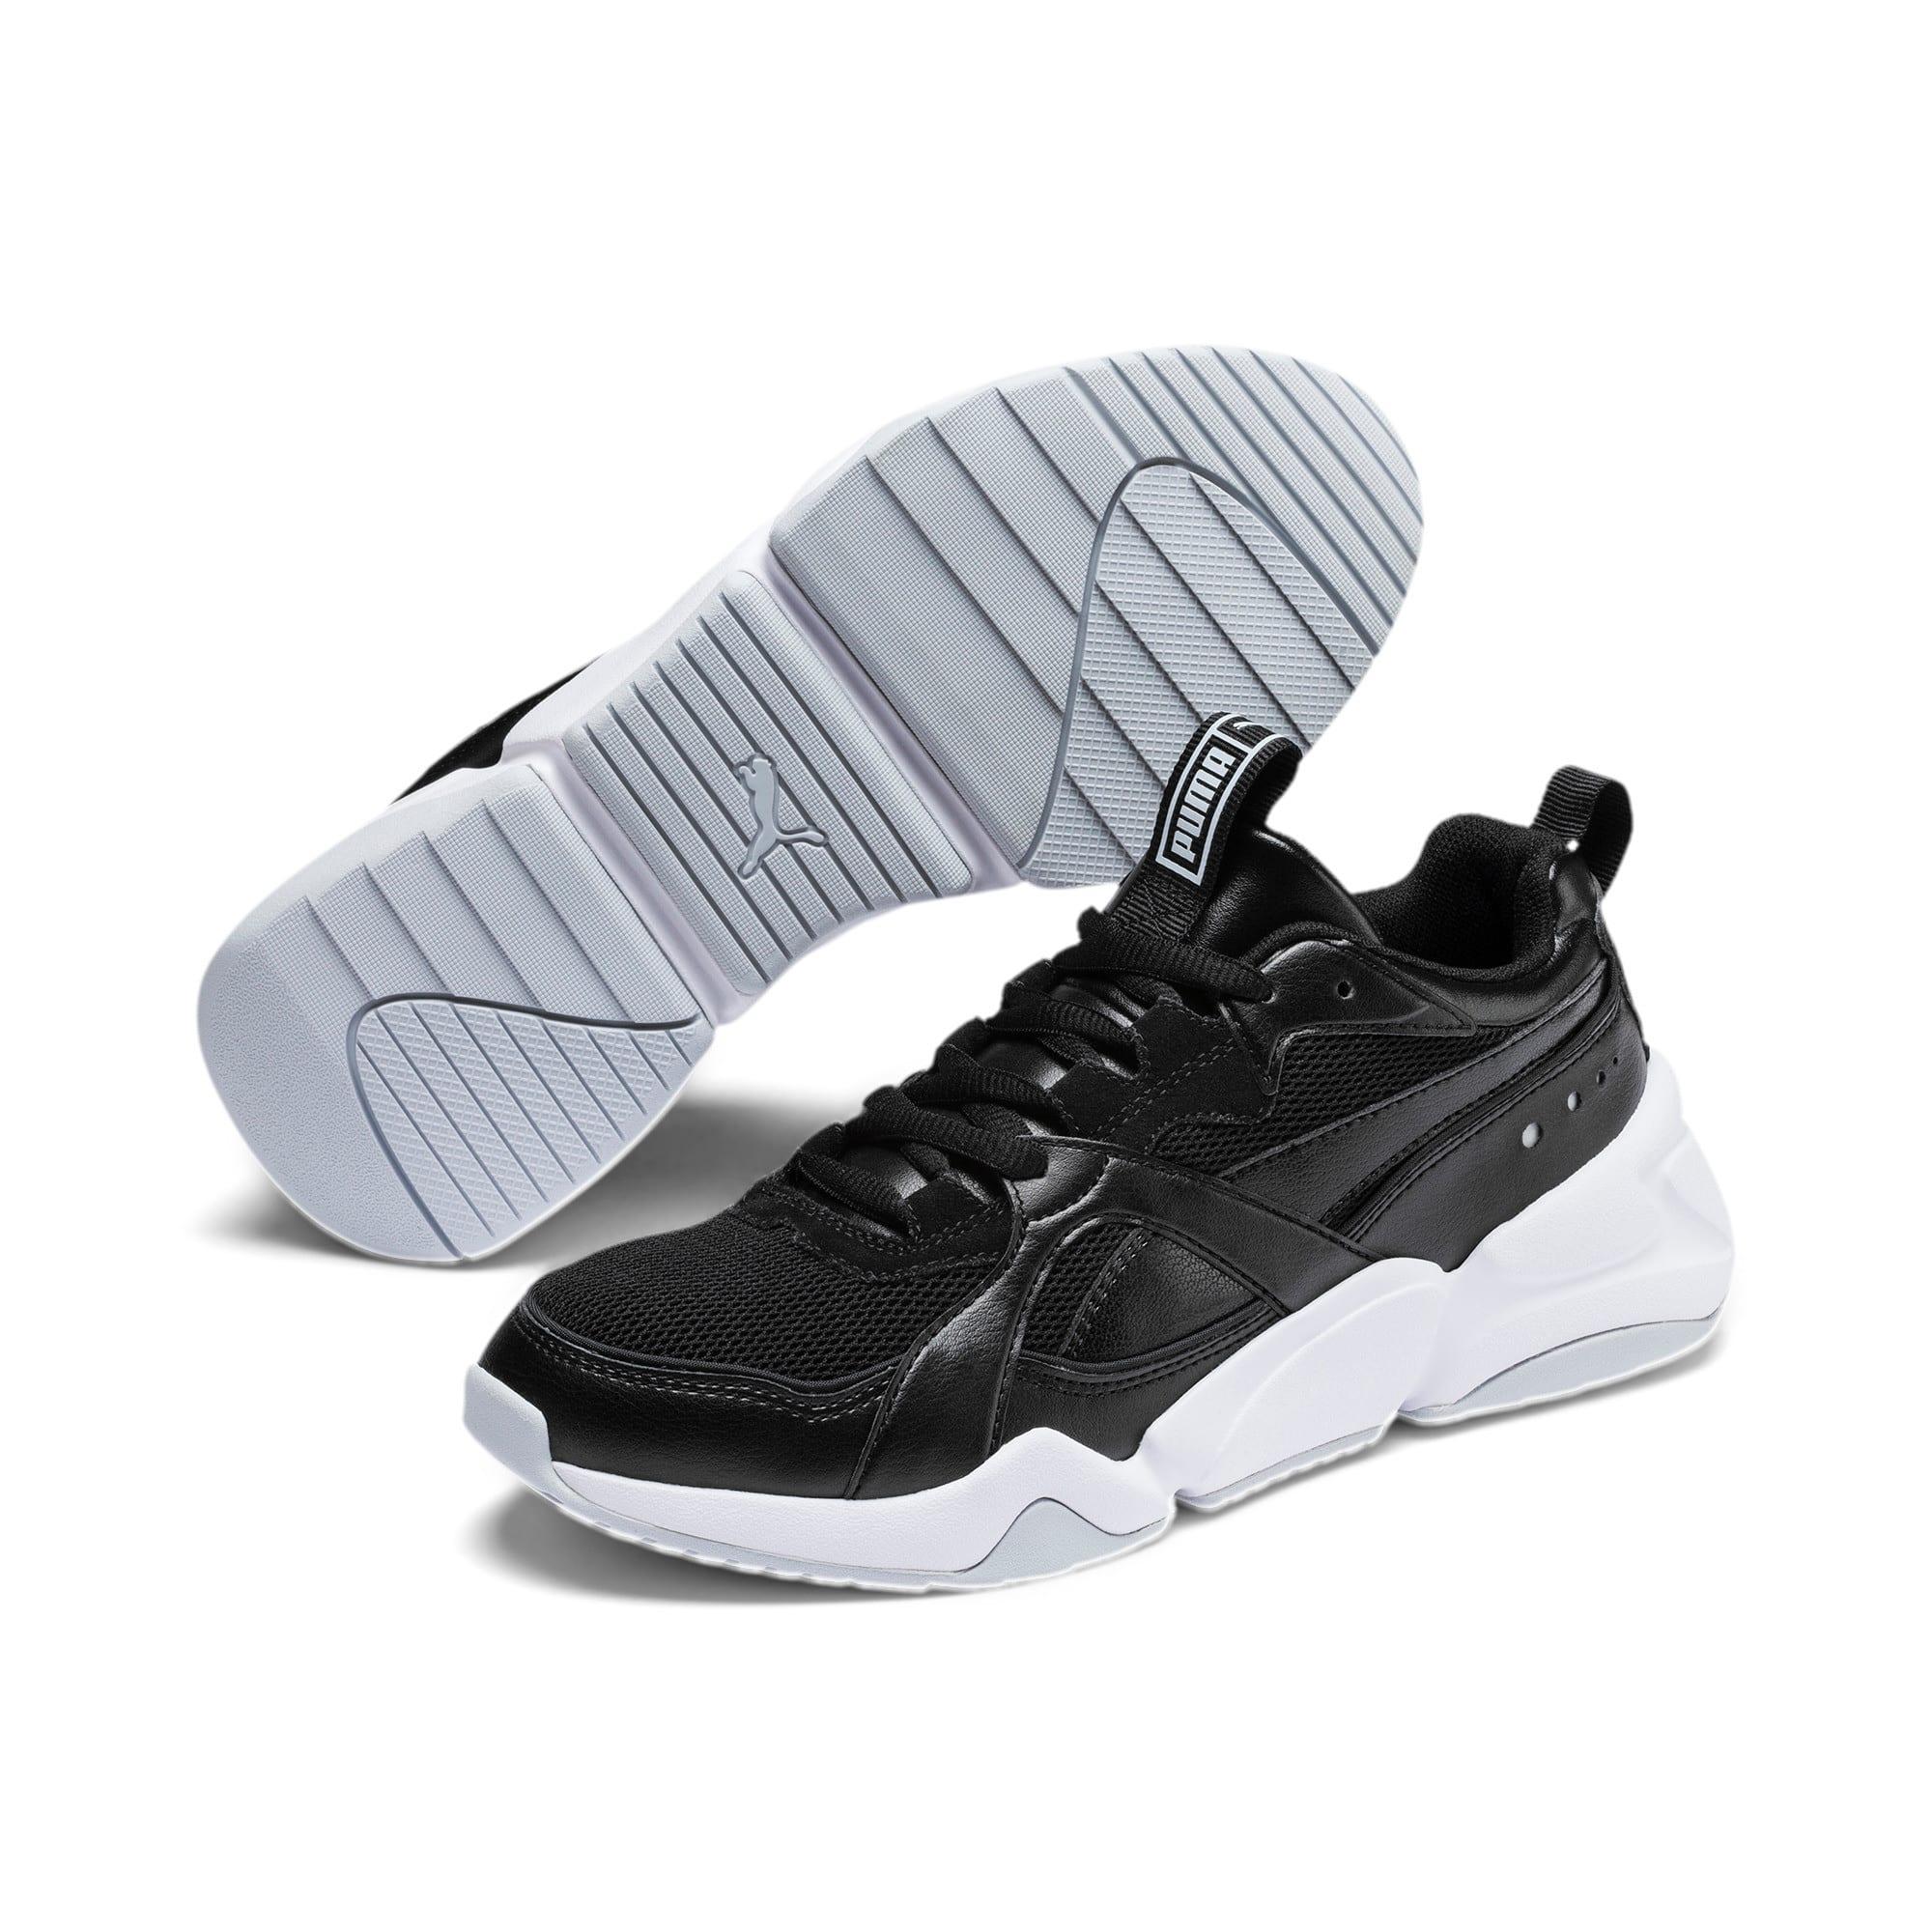 Thumbnail 3 of Nova 2 Women's Sneakers, Puma Black-Heather, medium